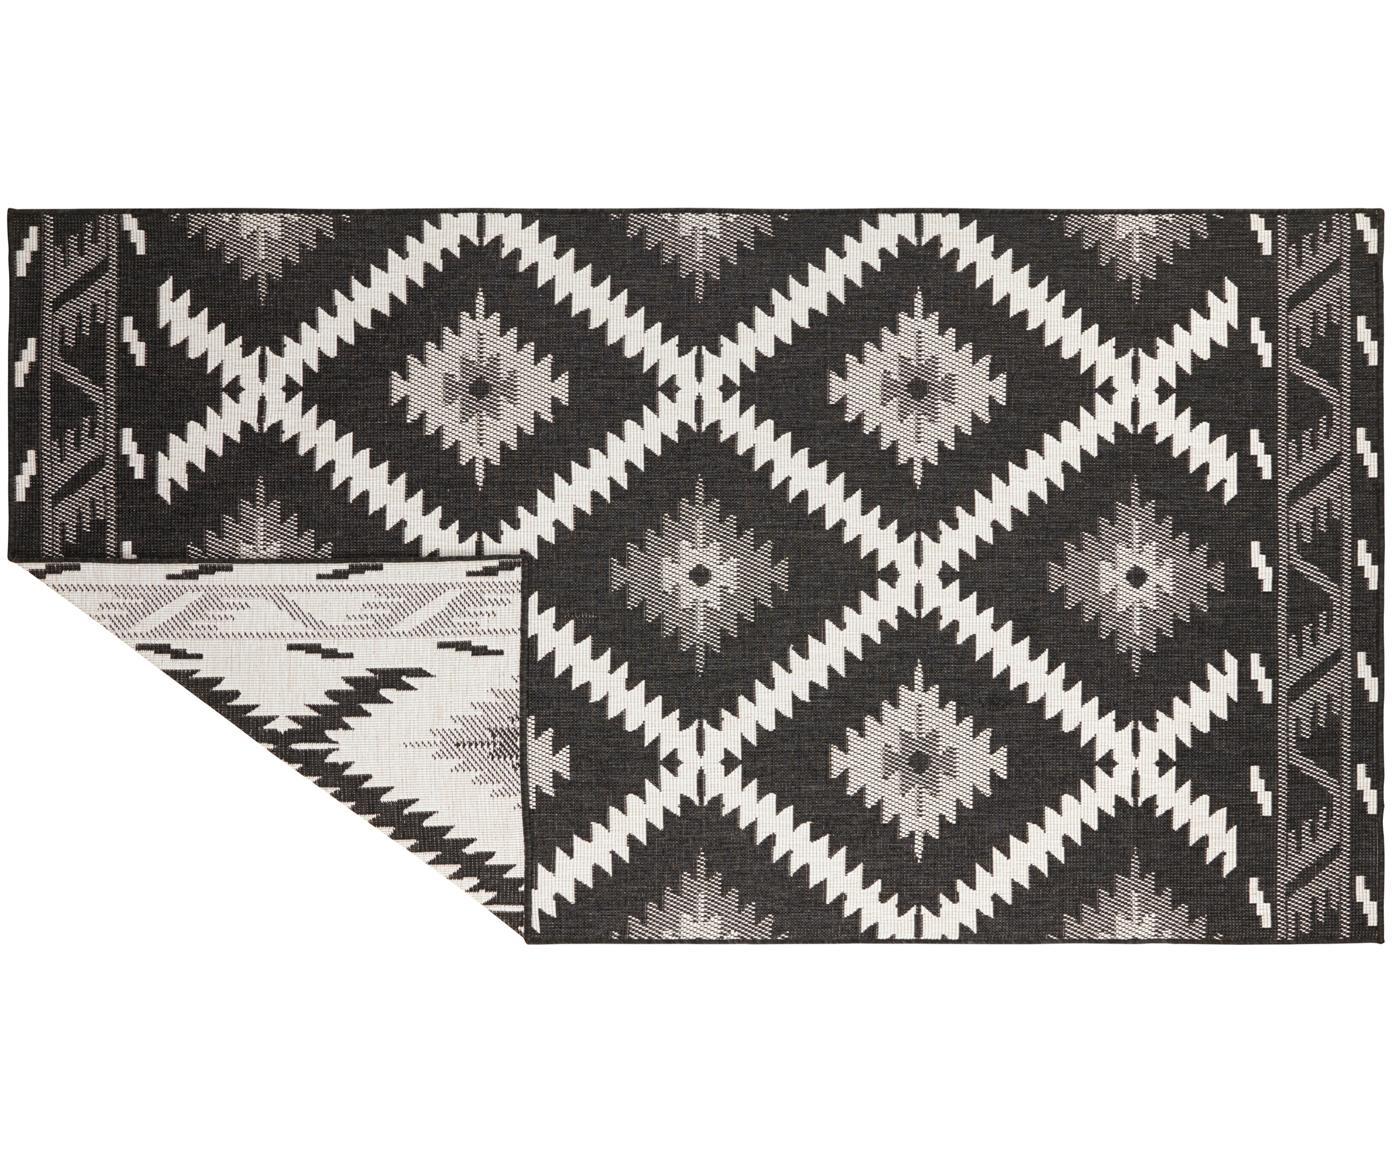 Alfombra de interior y exterior Malibu, caras distintas, Negro, crema, An 80 x L 150 cm (Tamaño XS)